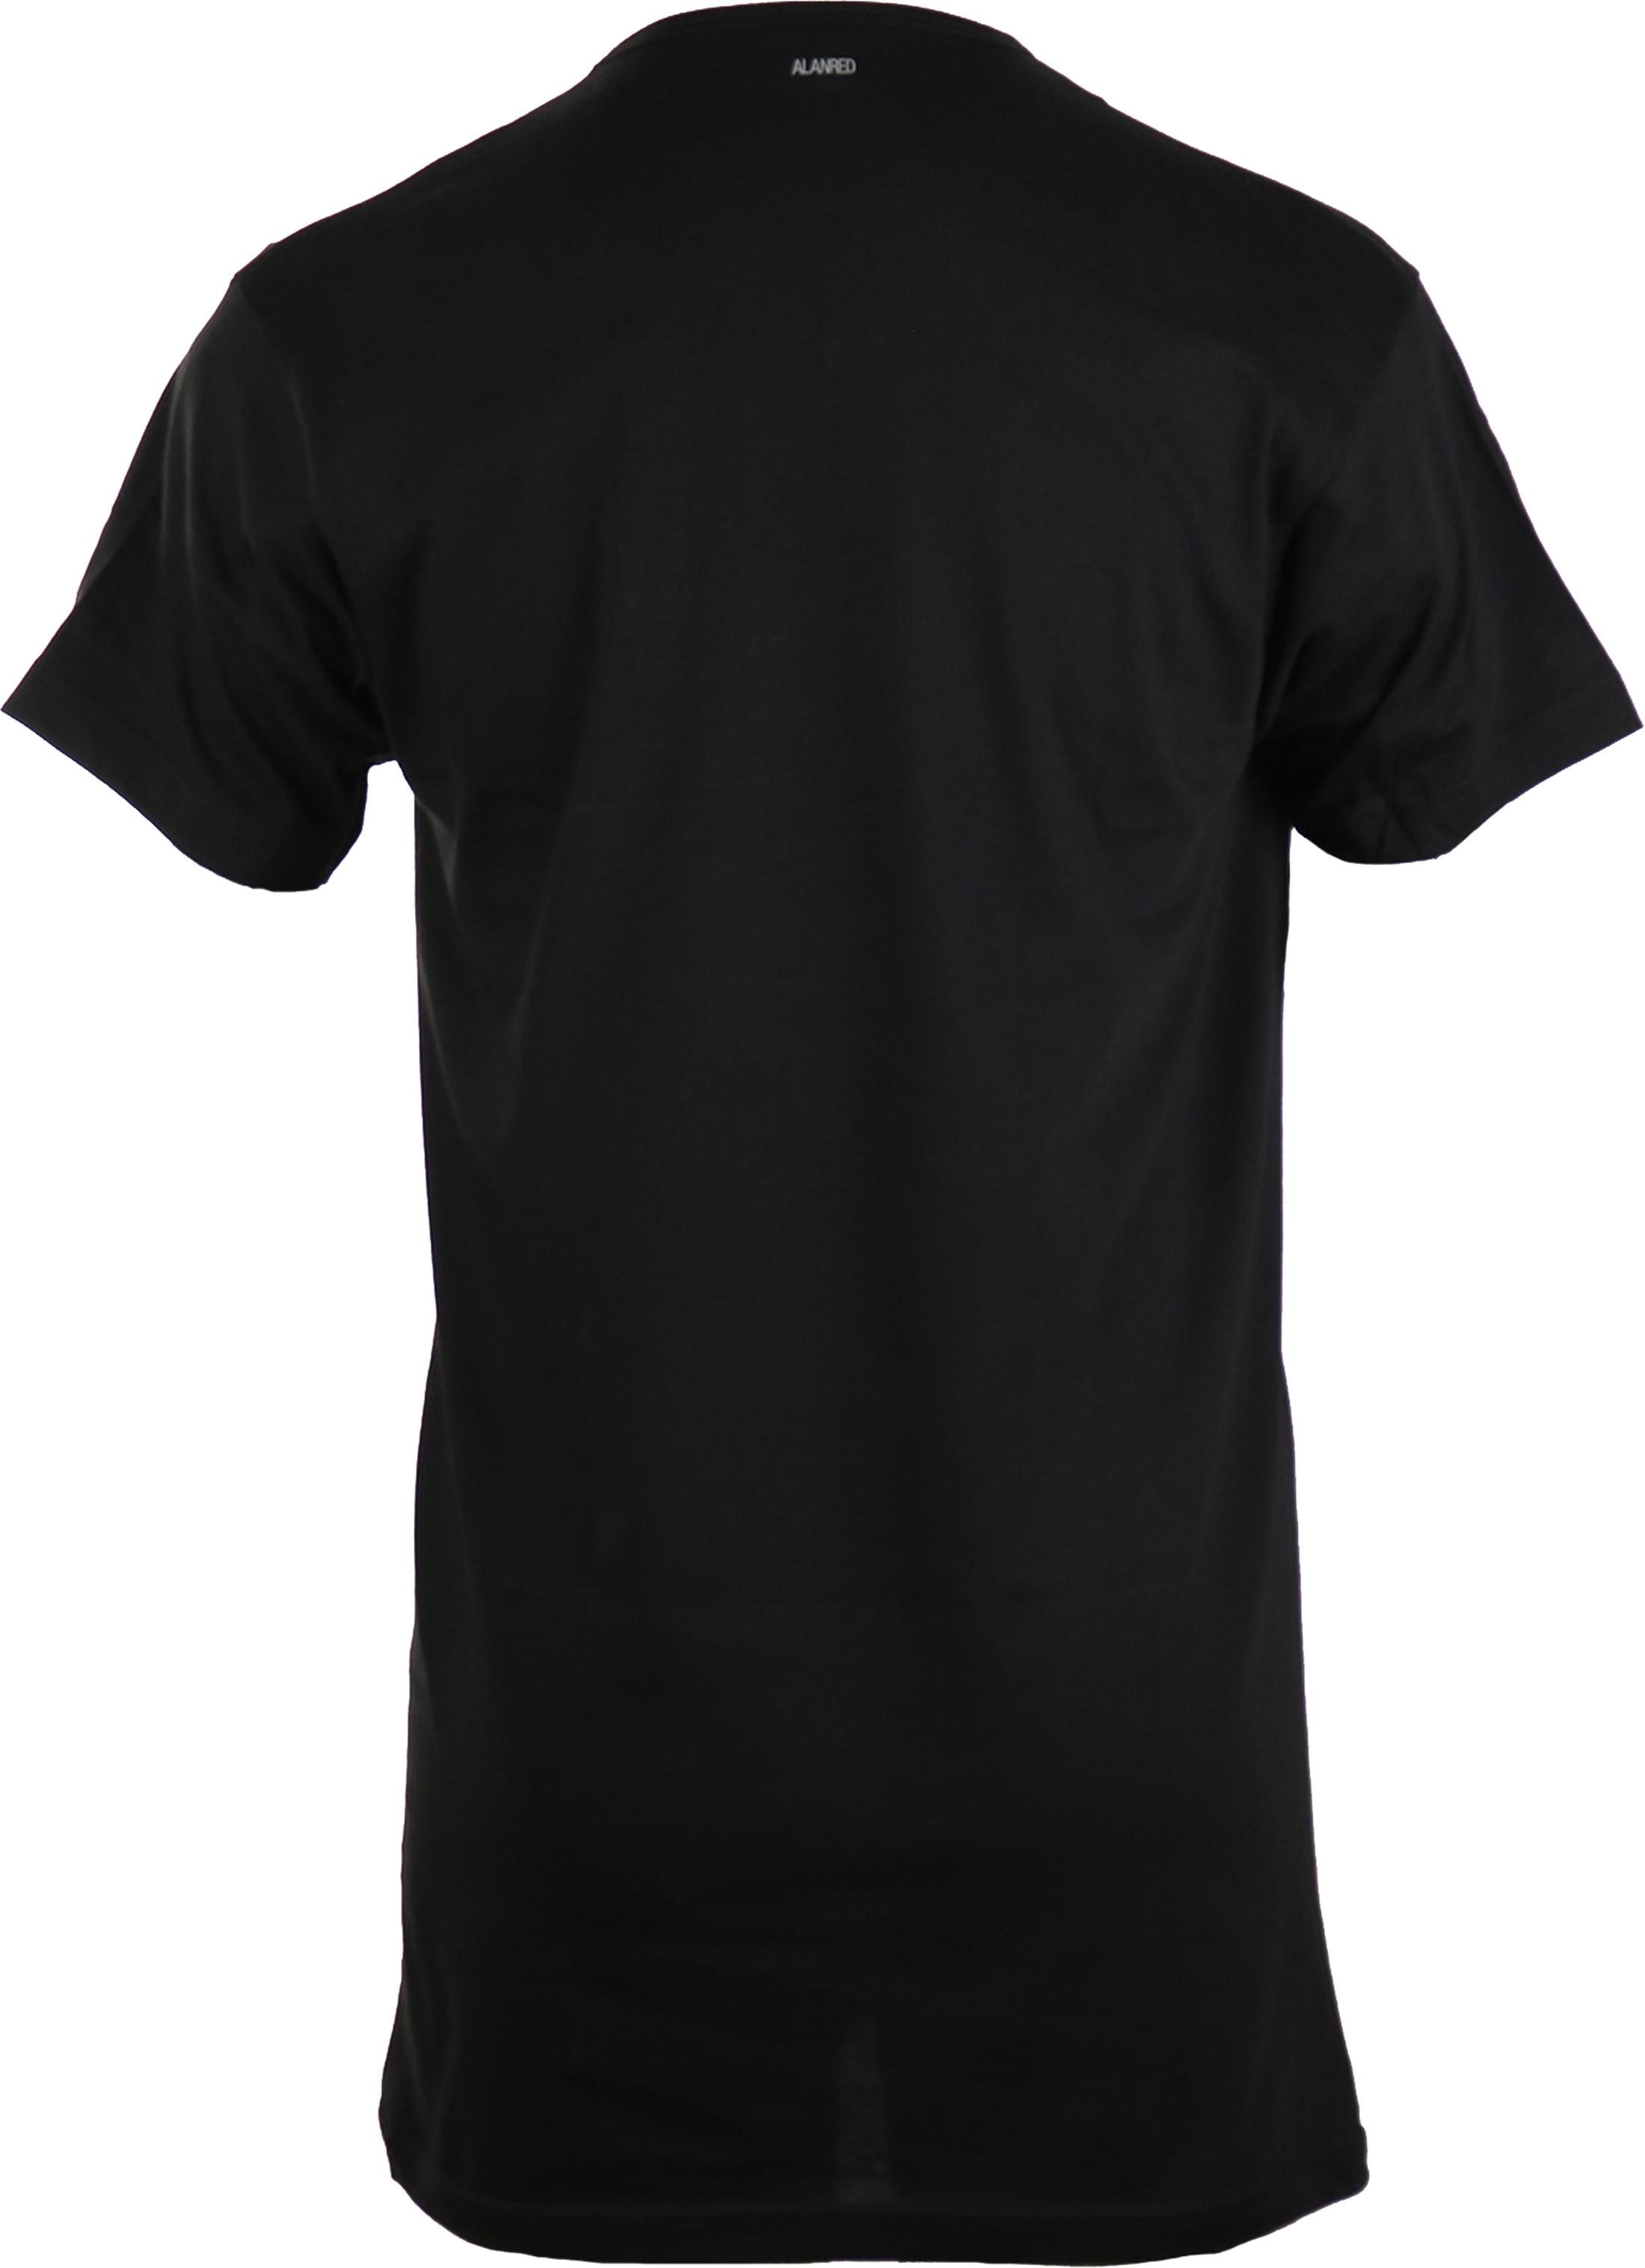 Alan Red Extra Lang T-Shirts Vermont Schwarz (1-Pack) foto 1